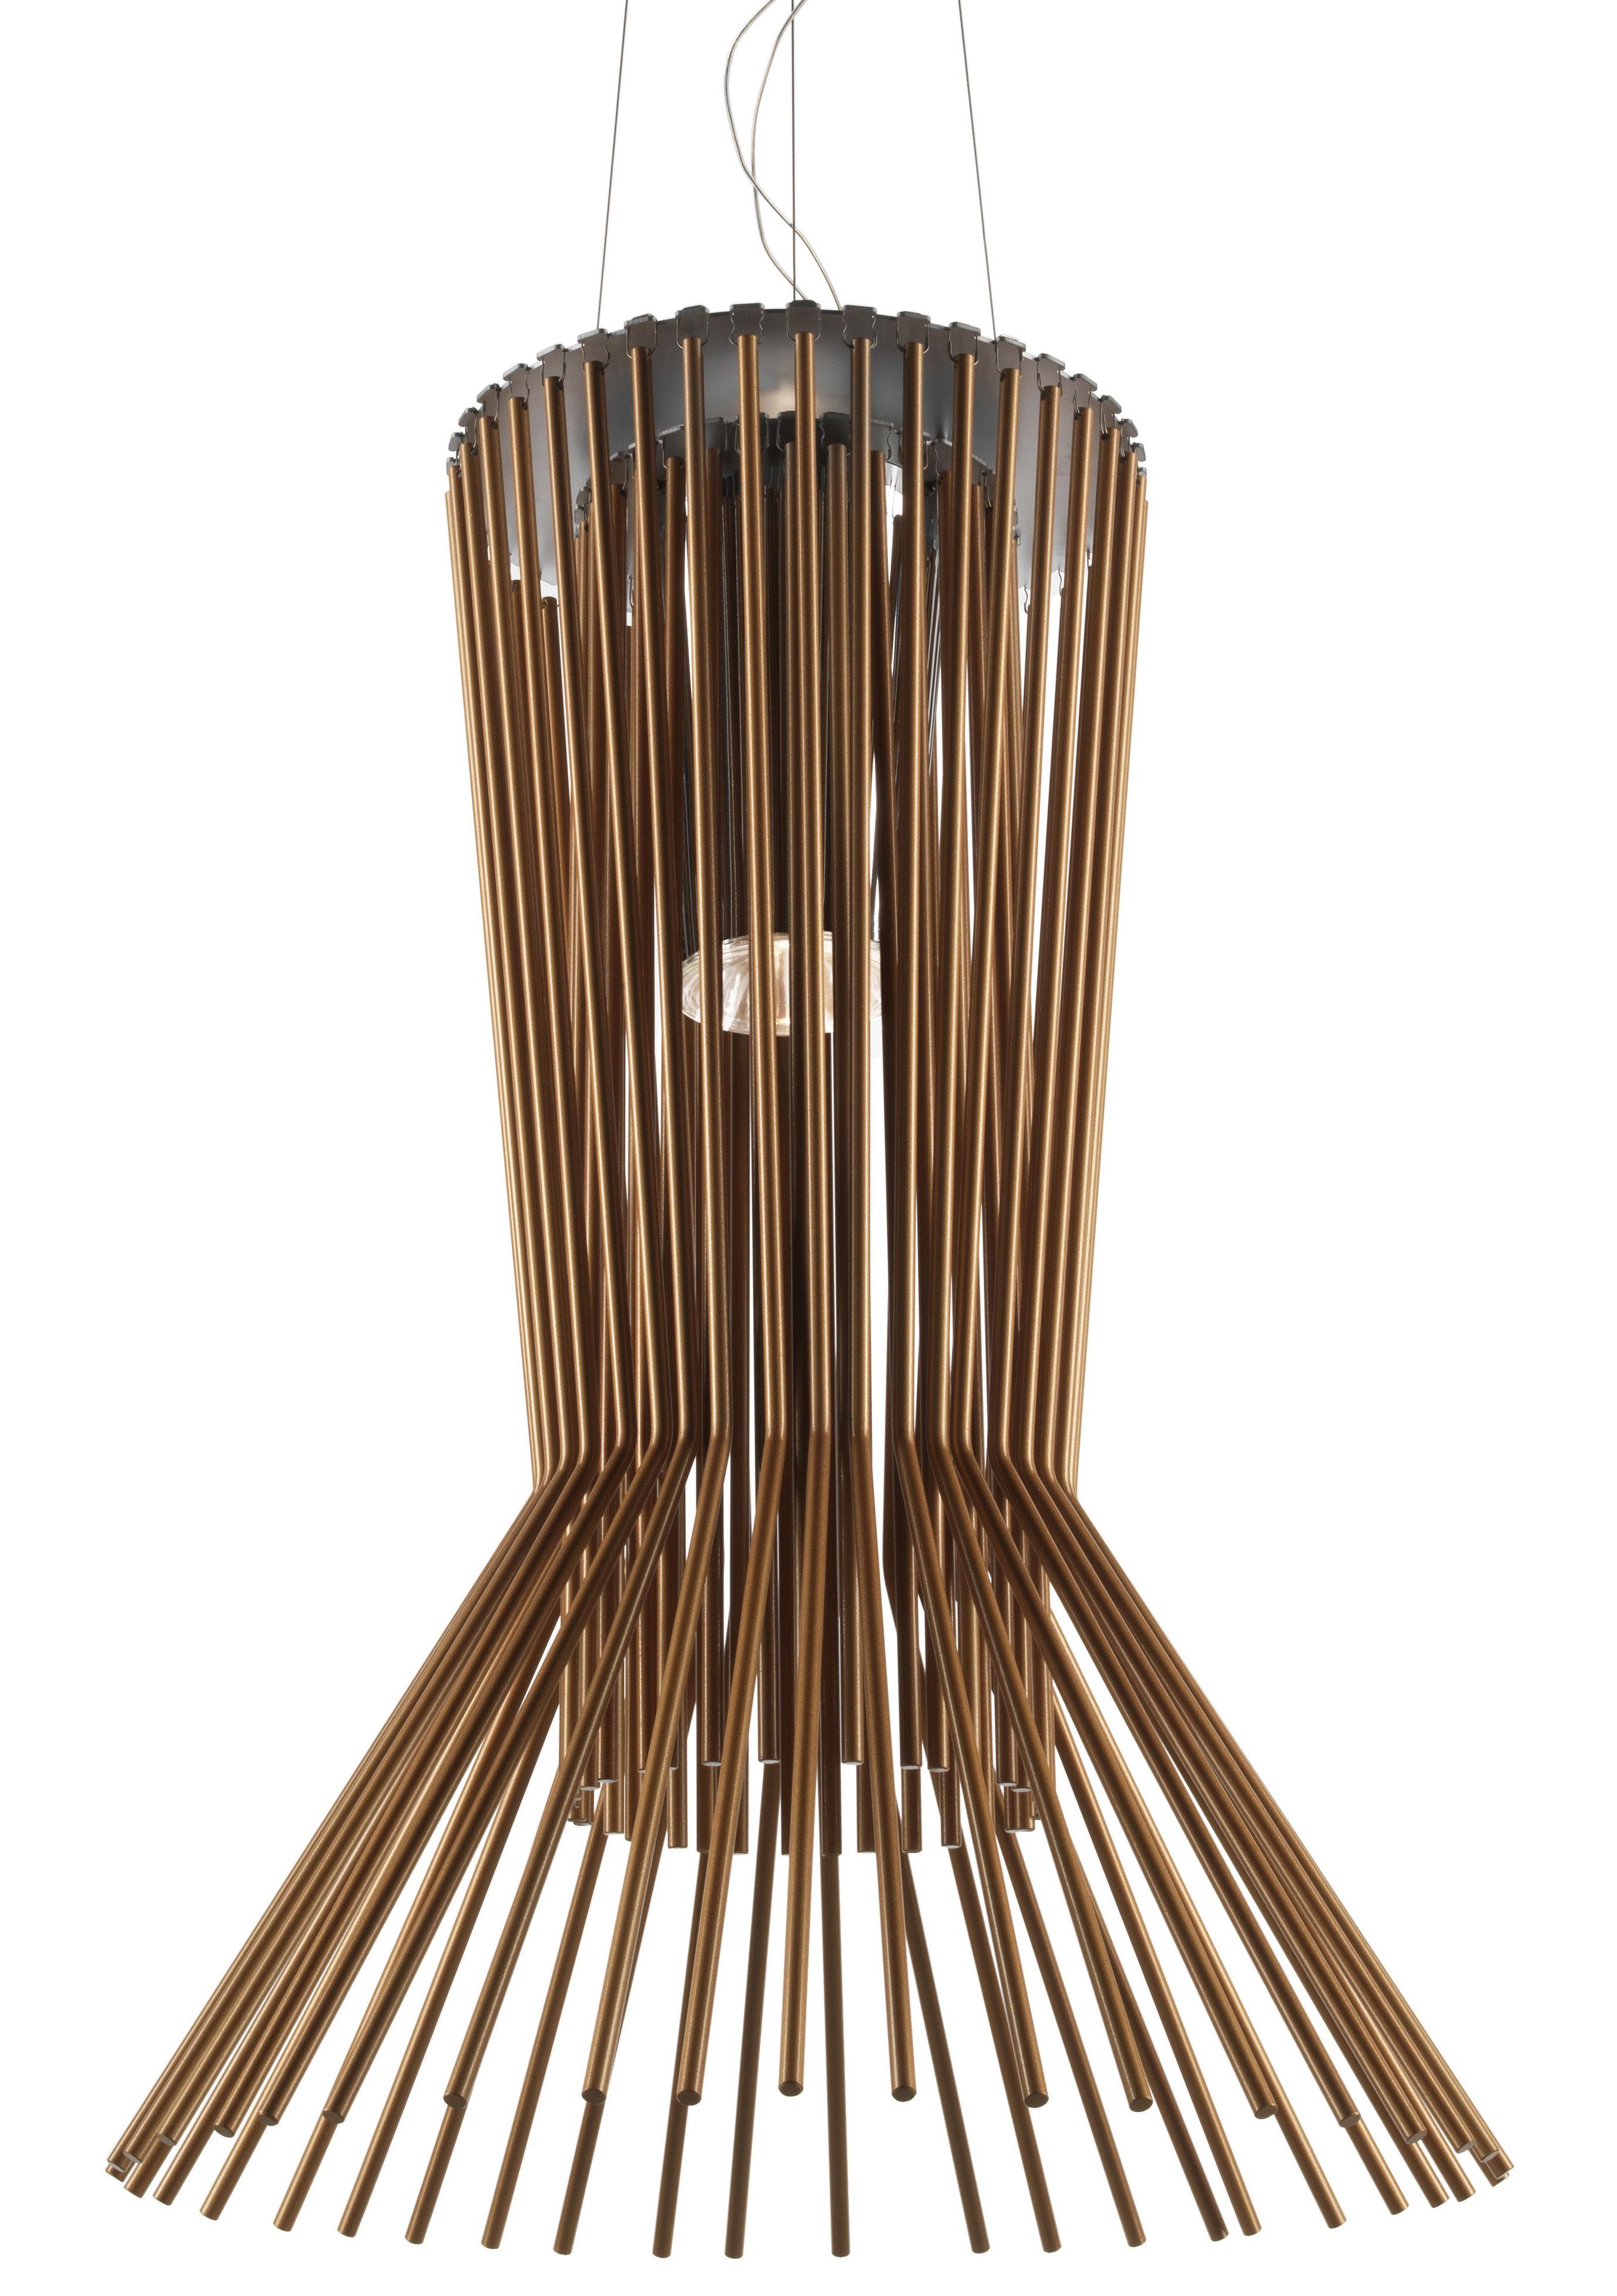 Lighting - Pendant Lighting - Allegro Vivace Pendant by Foscarini - Brown - Aluminium